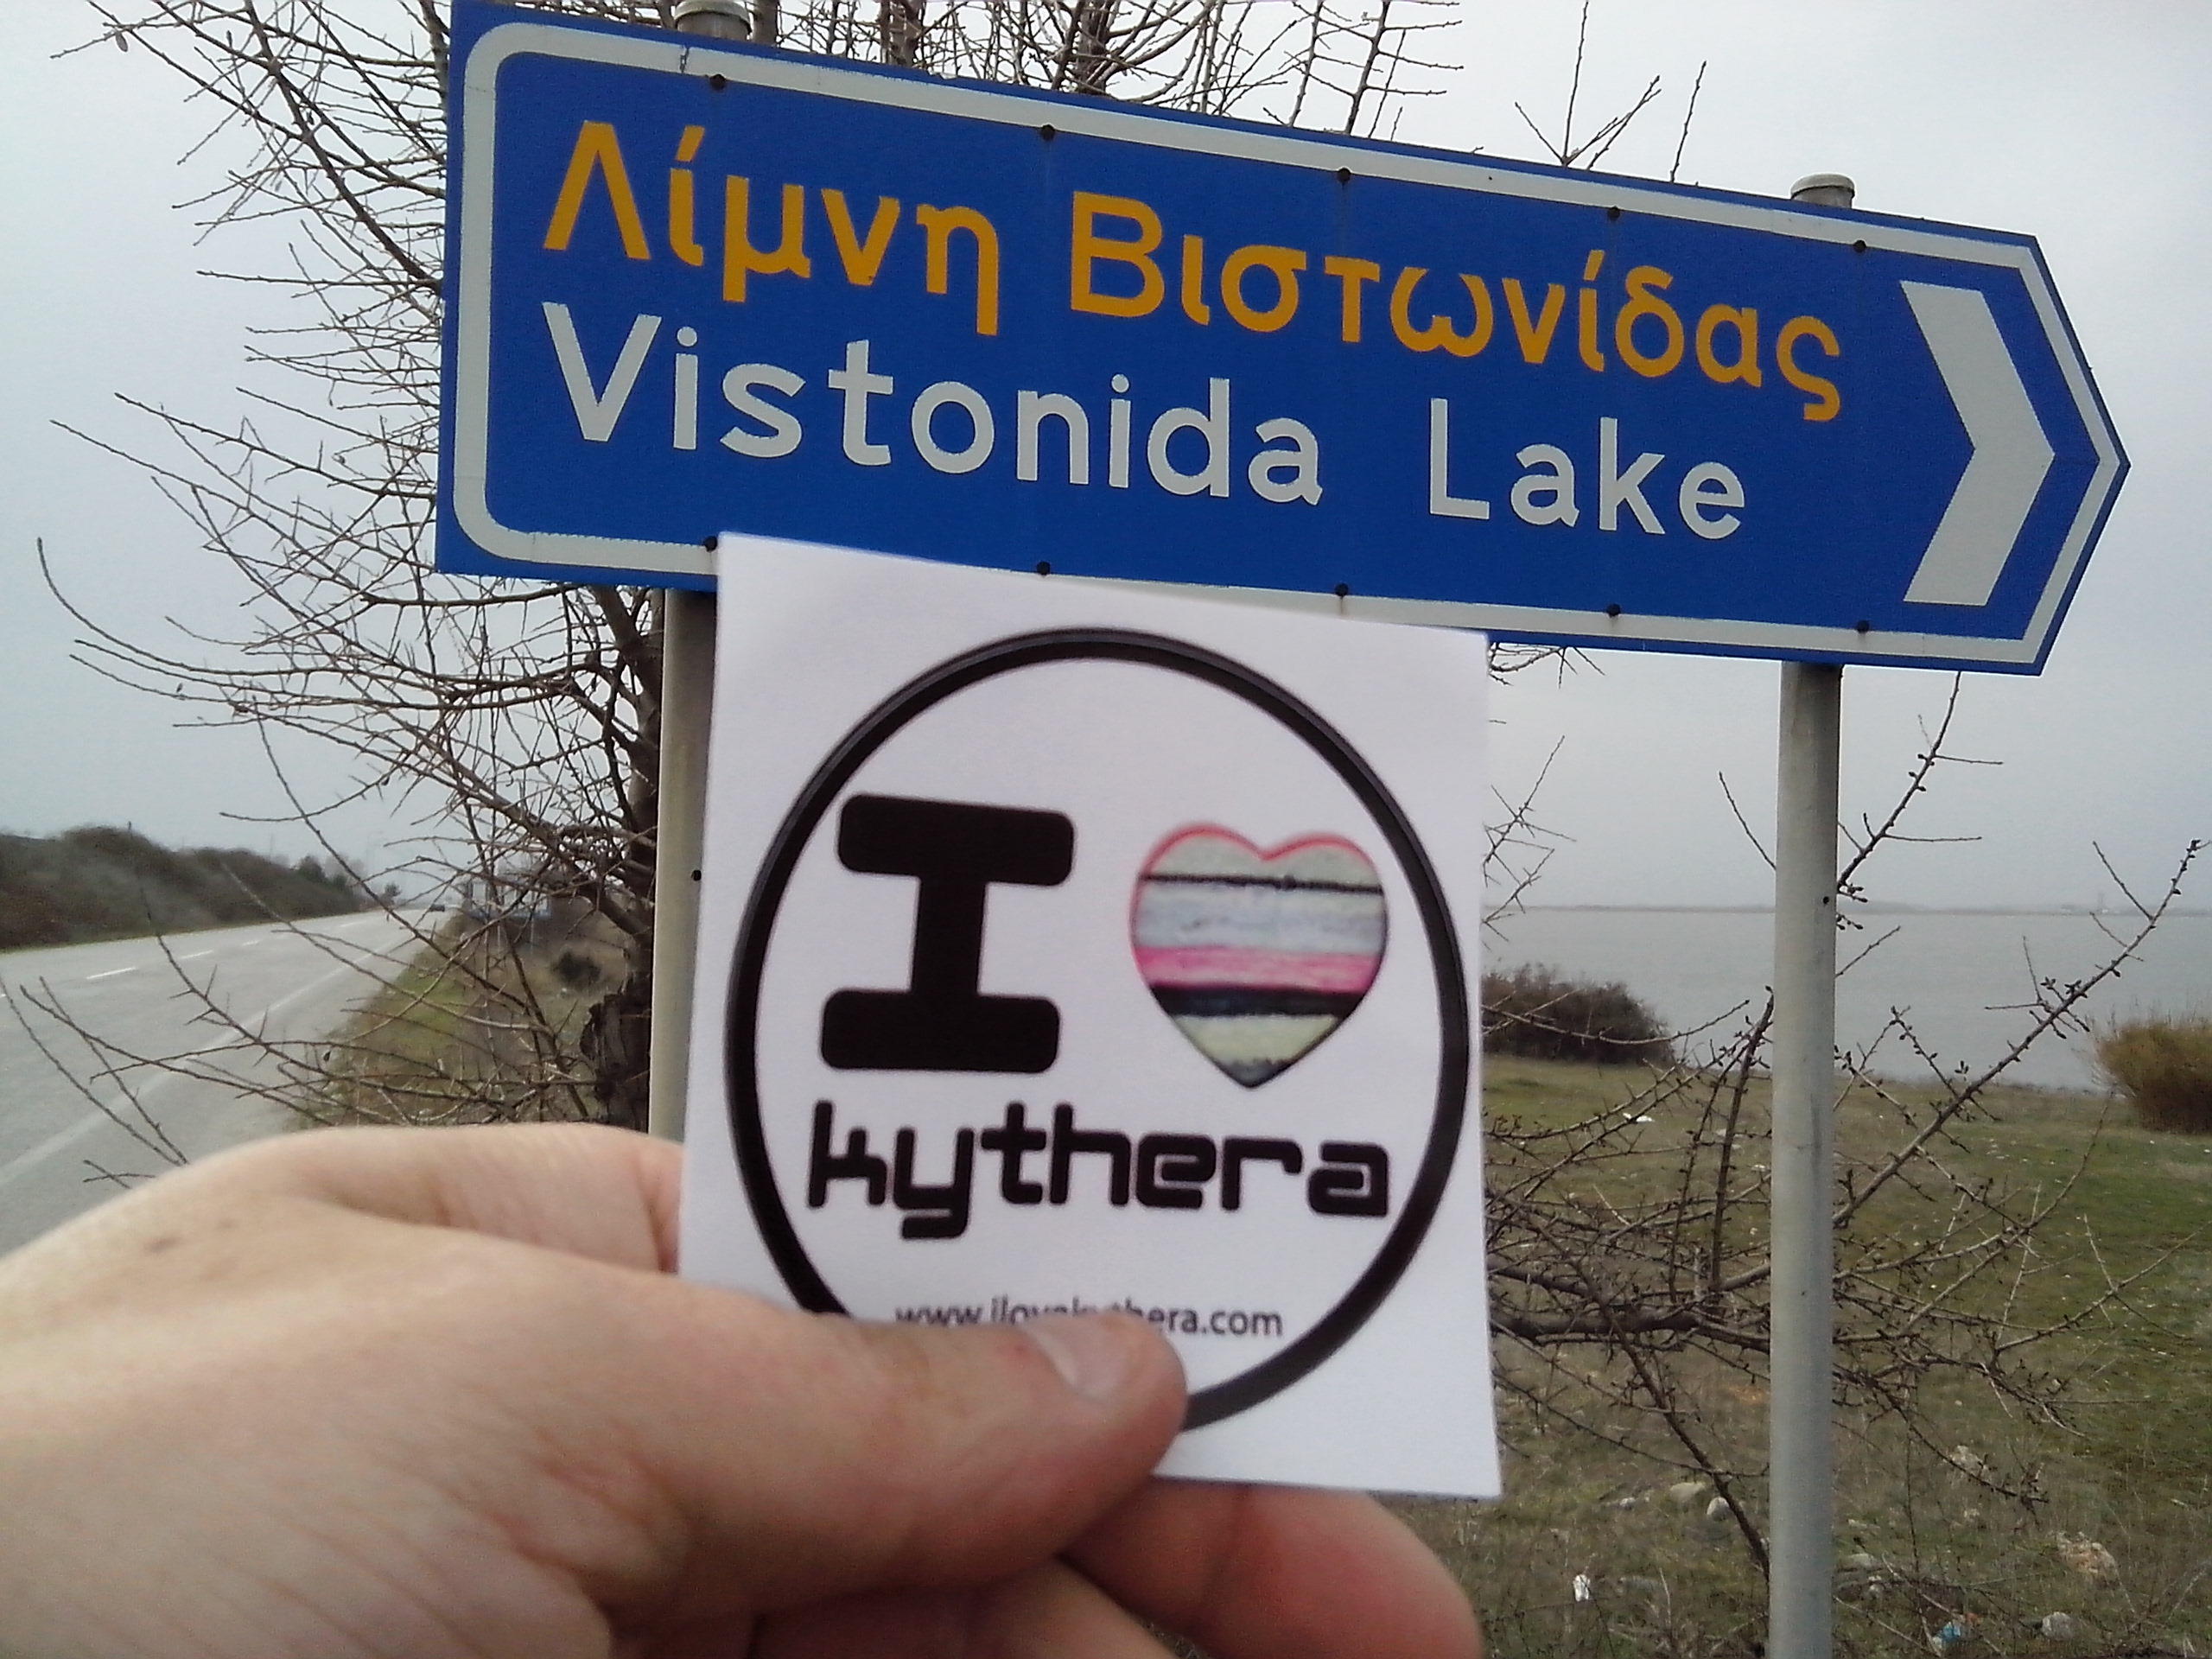 I love Kythera sticker, Greece